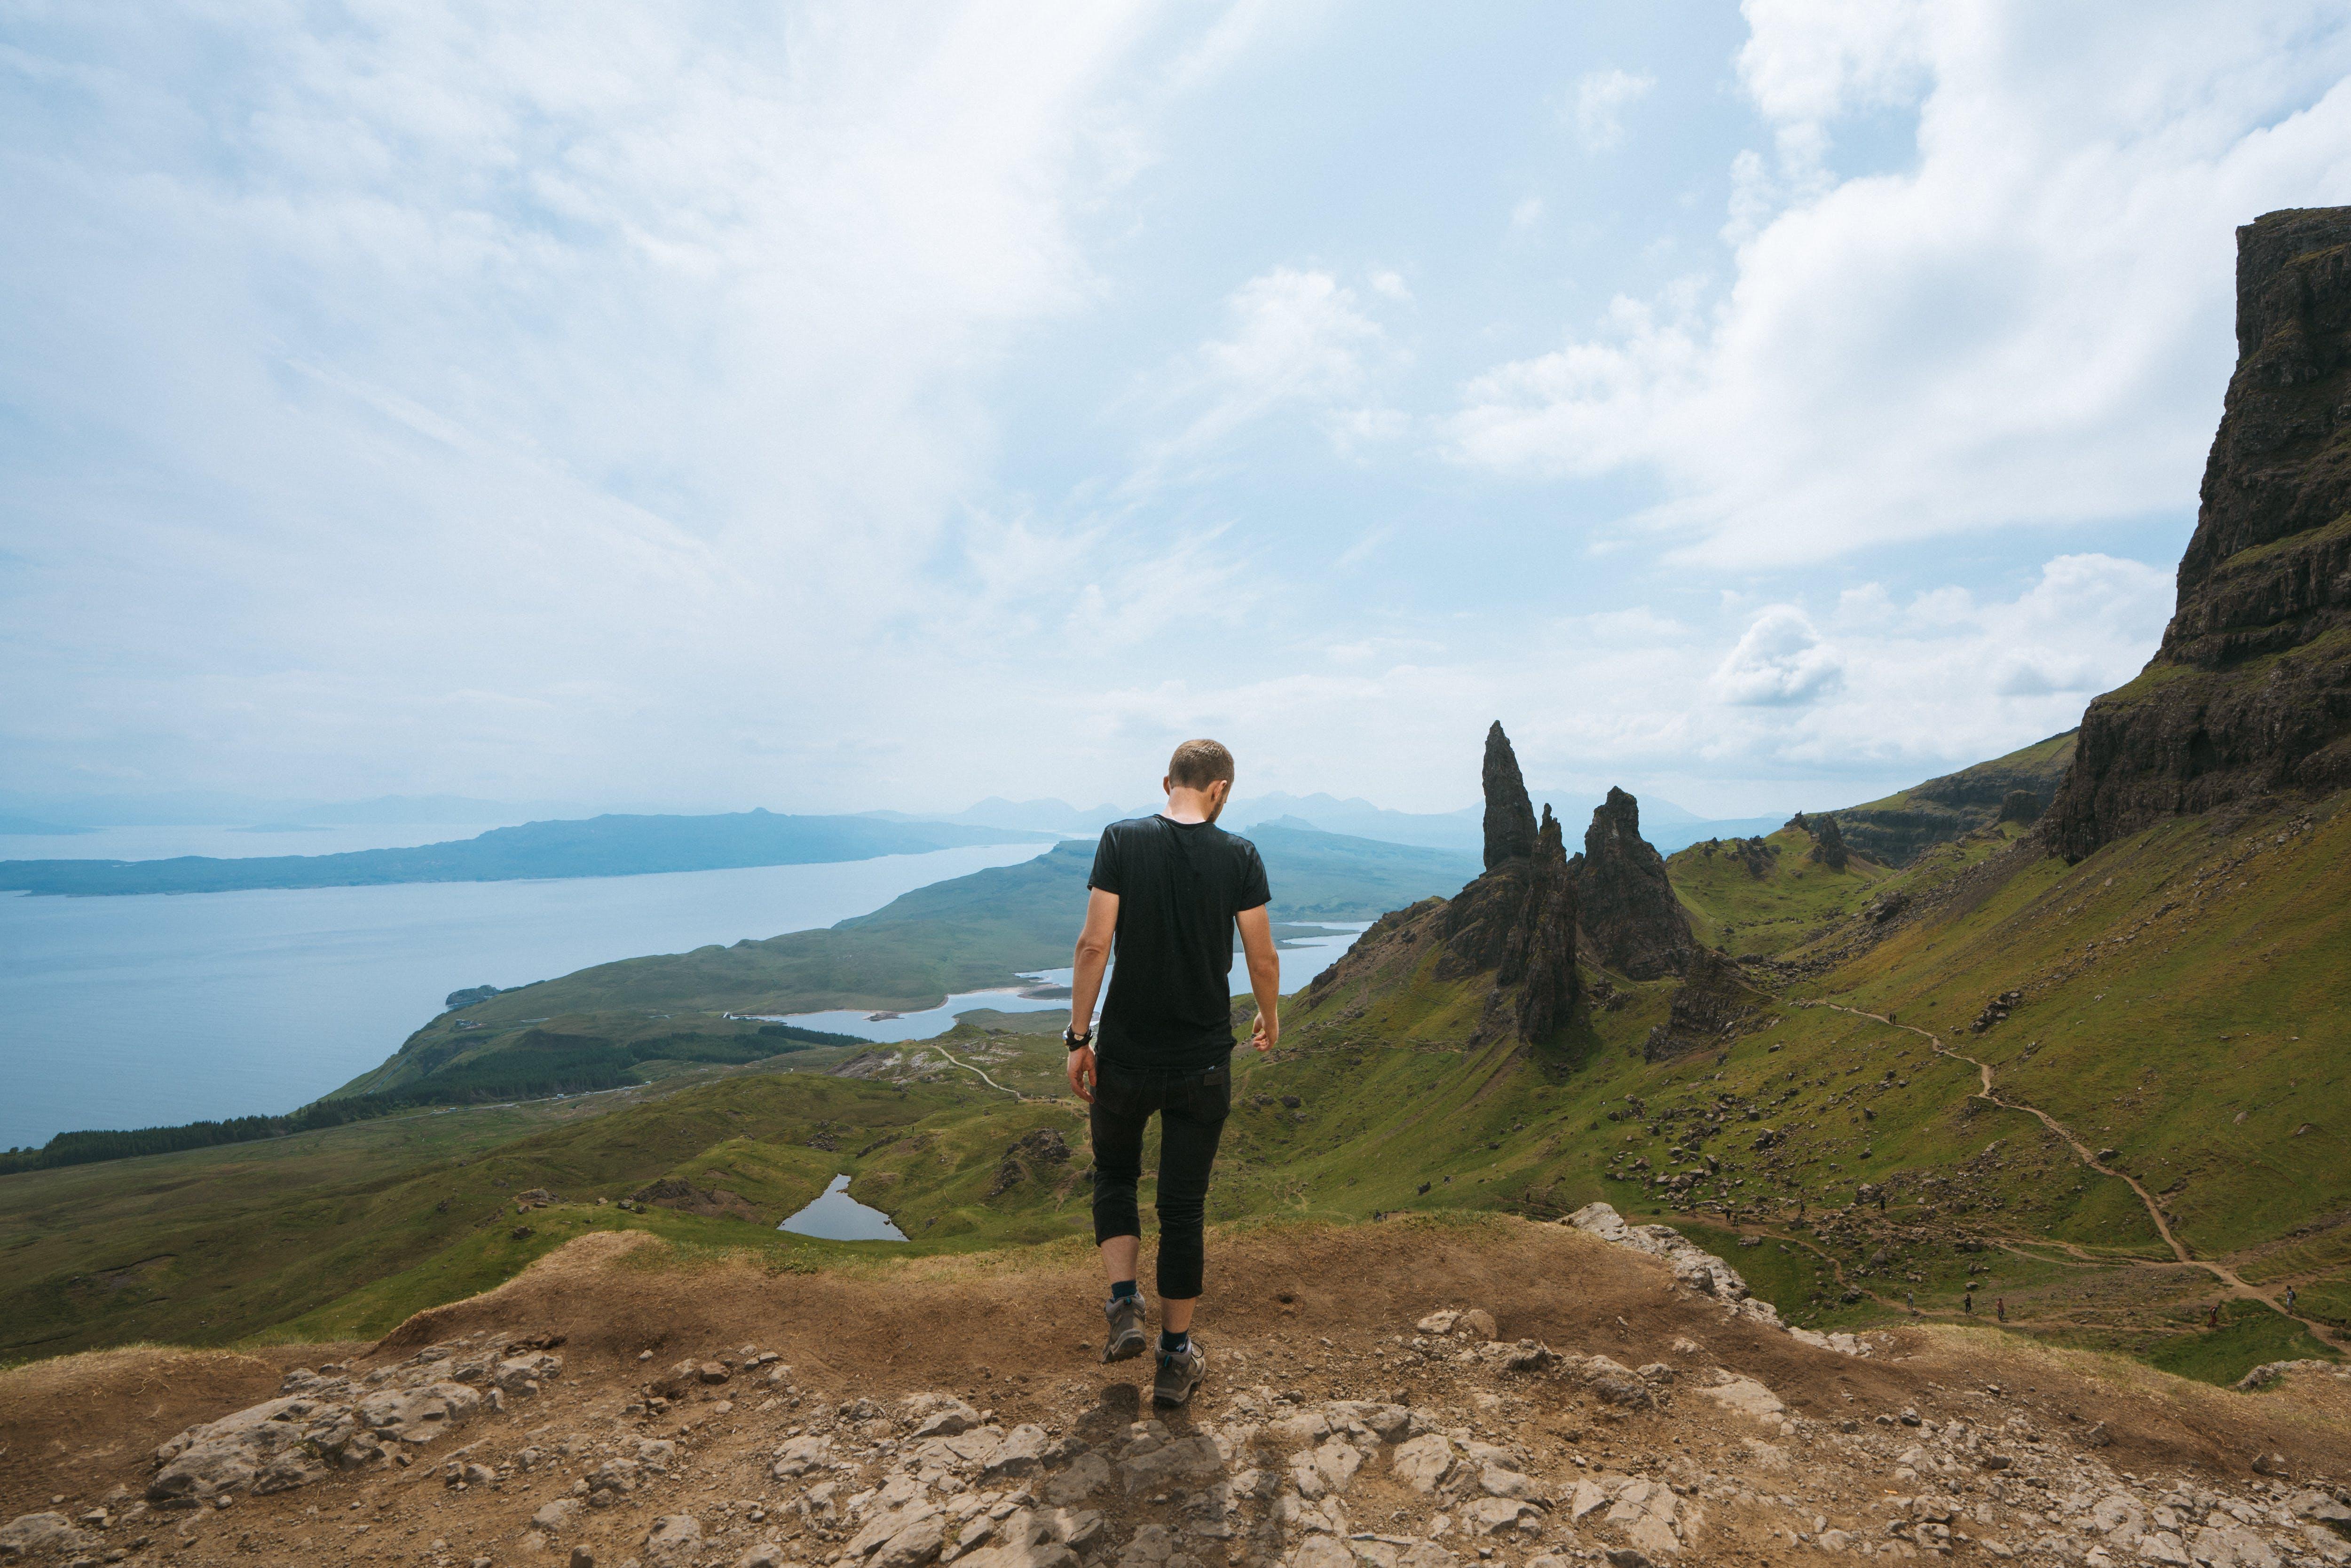 Man Wearing Black T-shirt Standing On Cliff